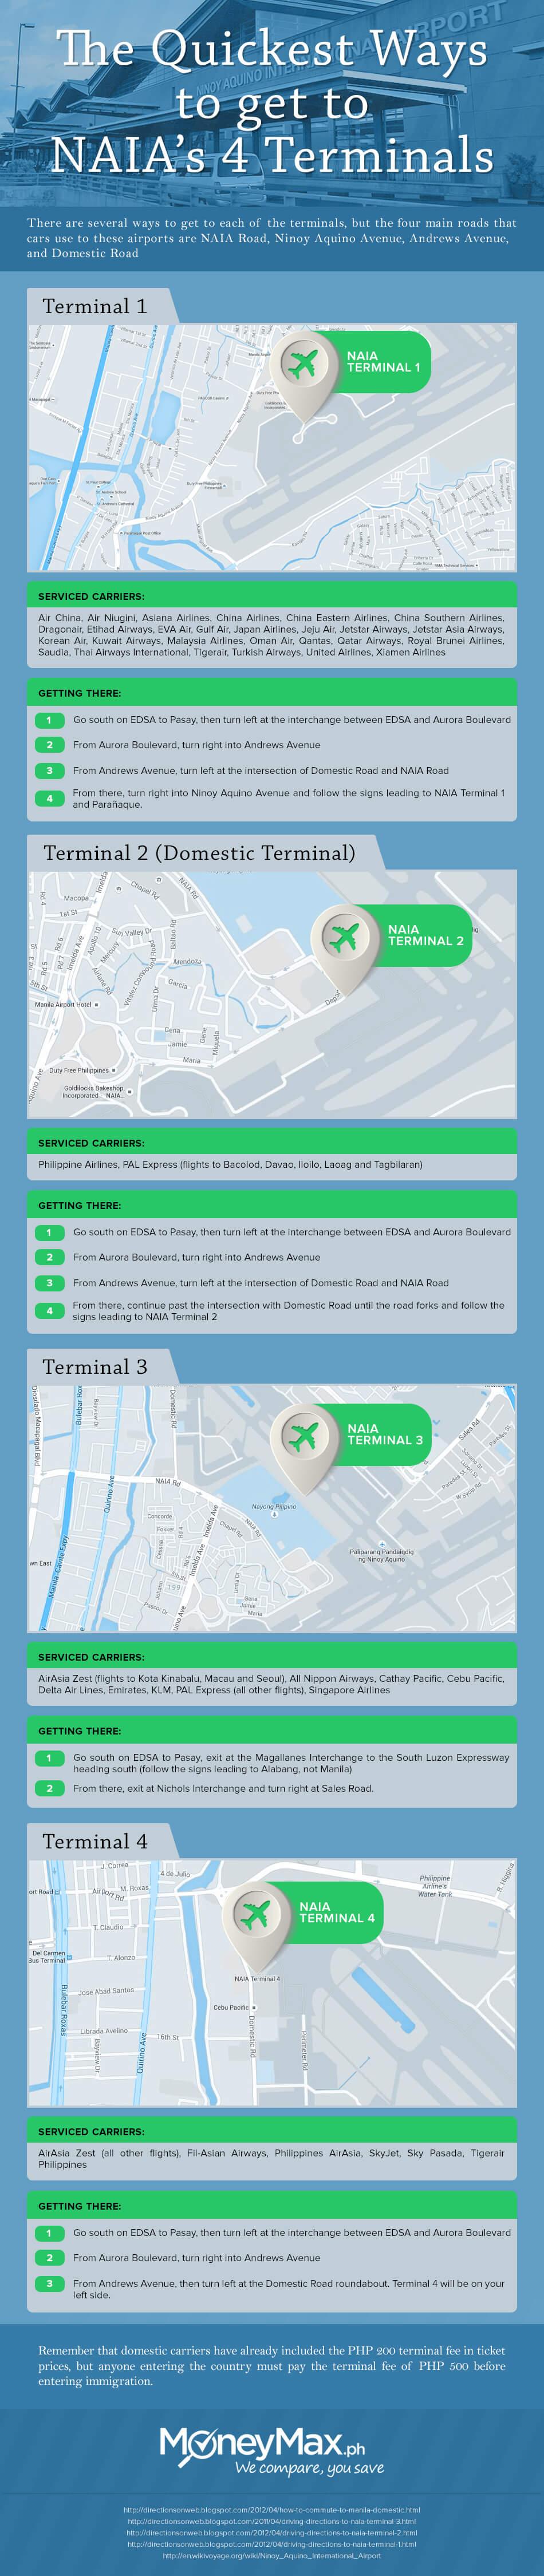 Quickest Ways to get to NAIA Terminals Infogprahic